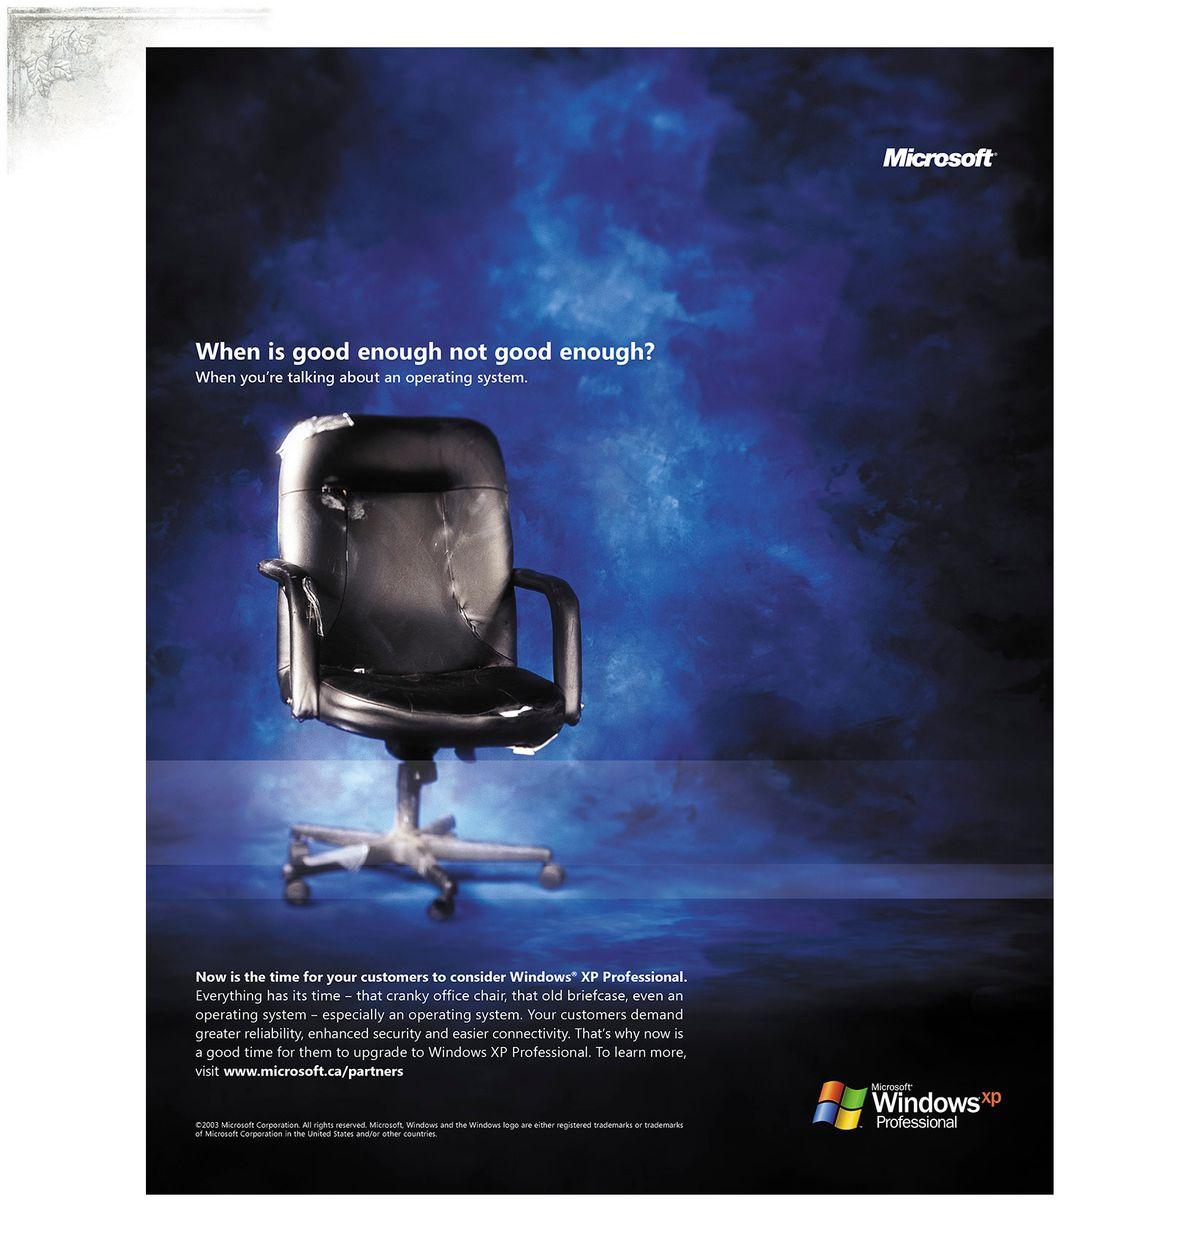 MicrosoftBluePortfPage.jpg